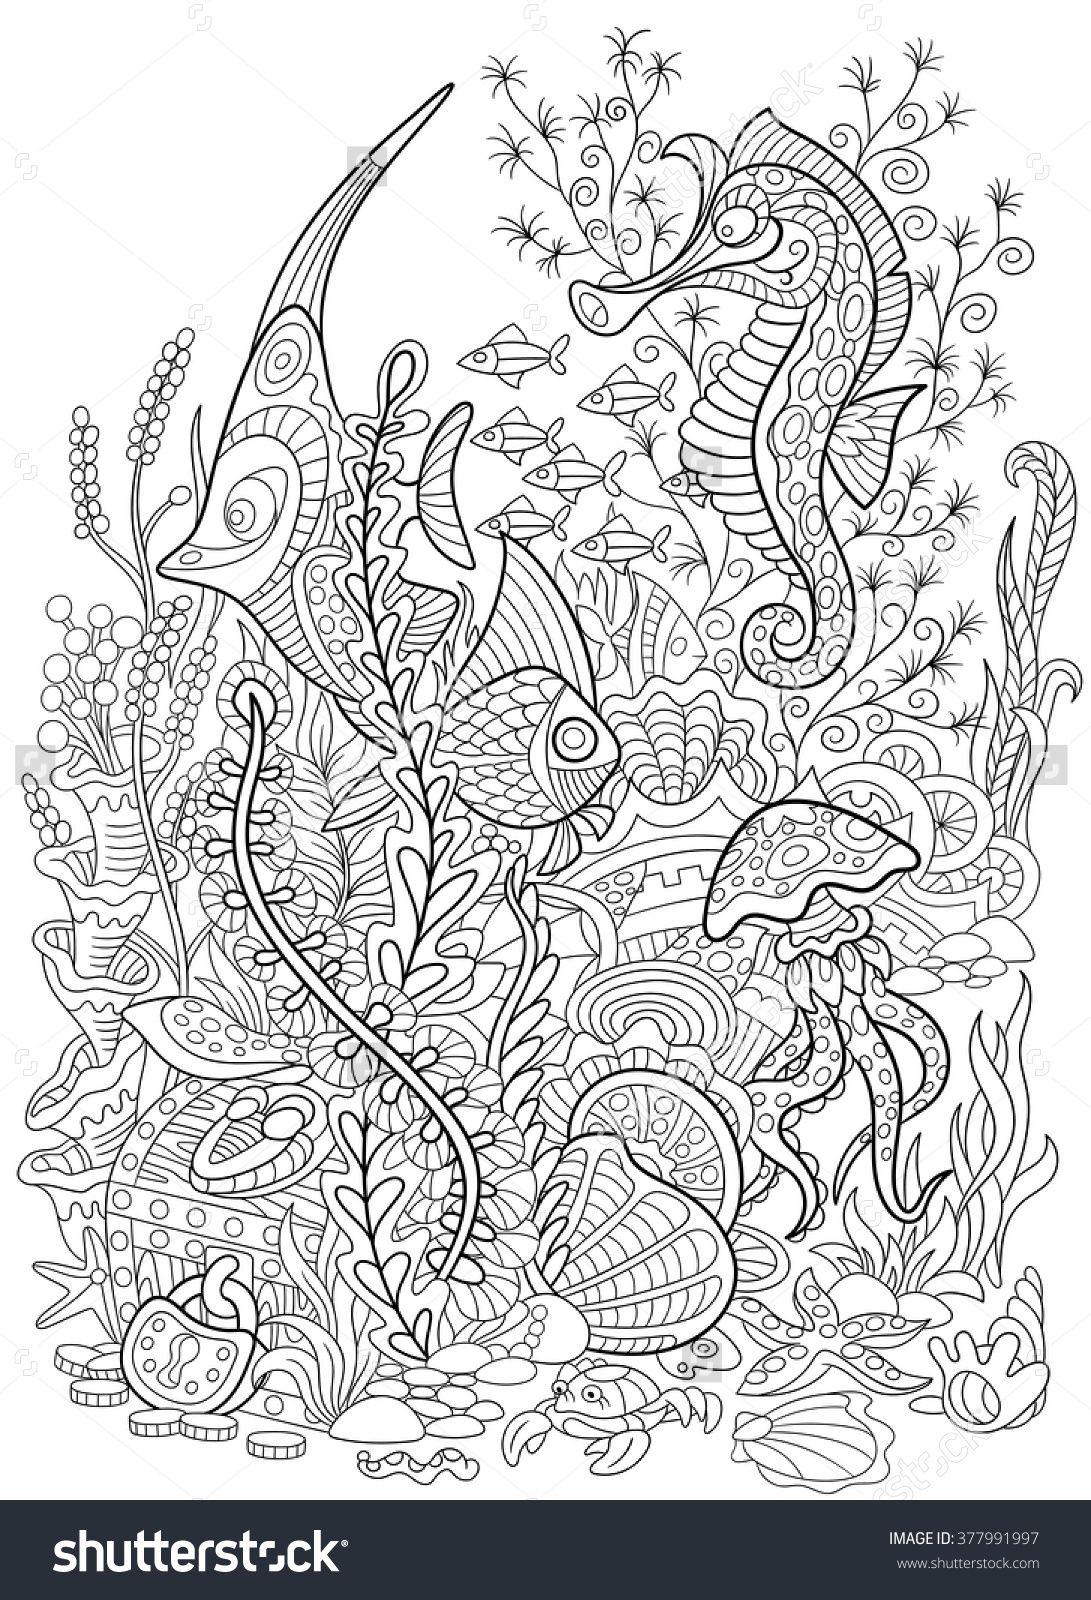 Zentangle Stylized Cartoon Fish Seahorse Jellyfish Crab